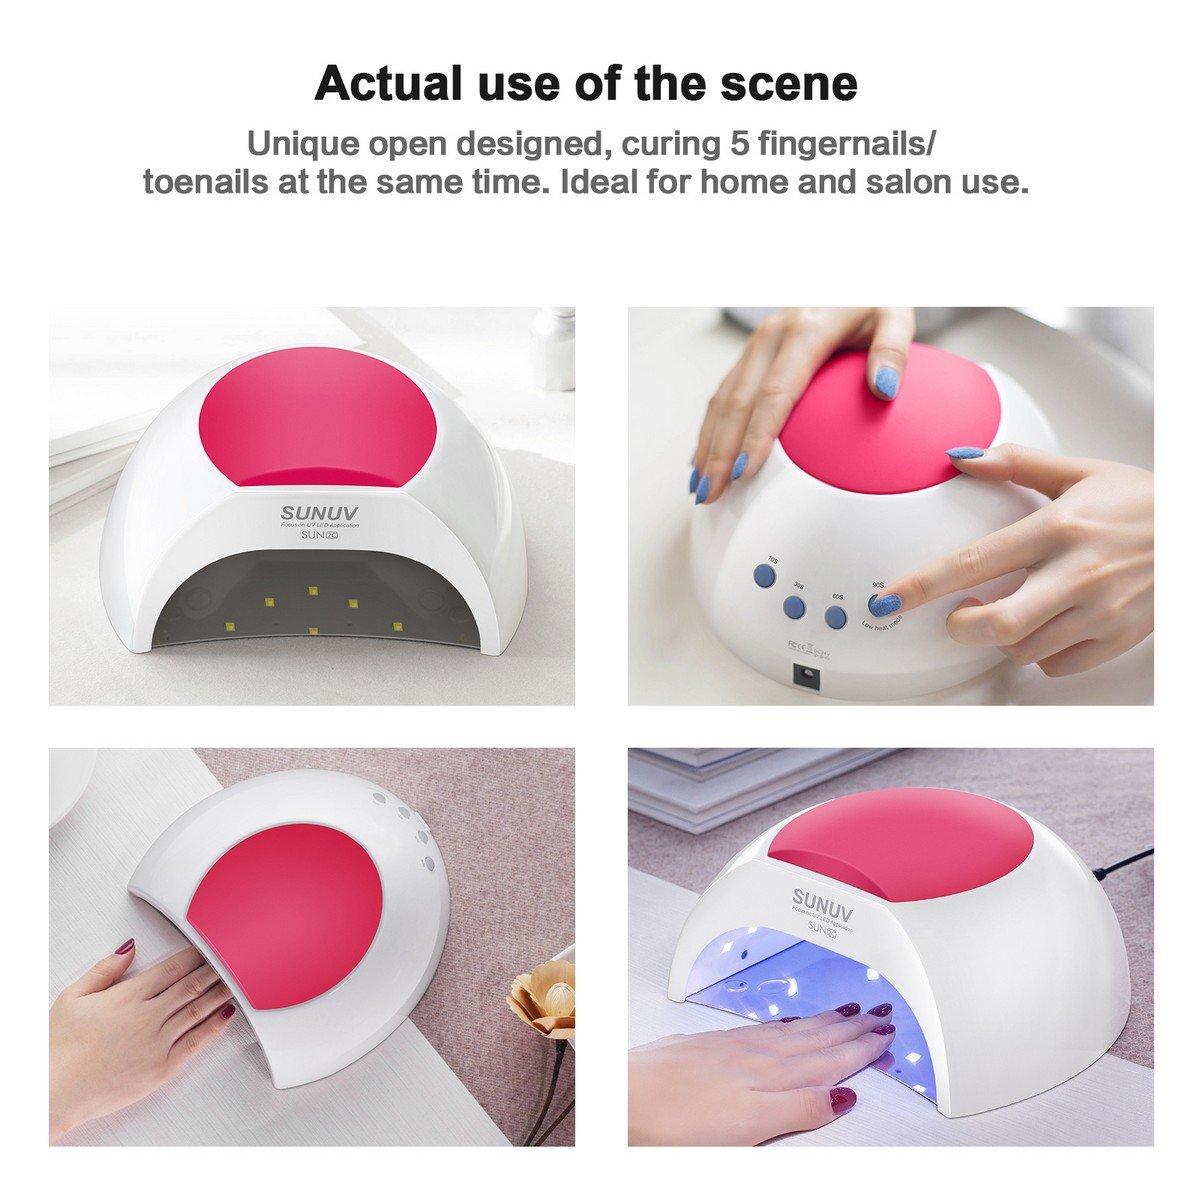 Gel UV Nail Lamp, SUNUV 48W UV LED Nail Dryer Light for Gel Nails Polish Manicure Professional Salon Curing Lamp with 4 Timer Setting Sensor SUN2C(one pink pad)